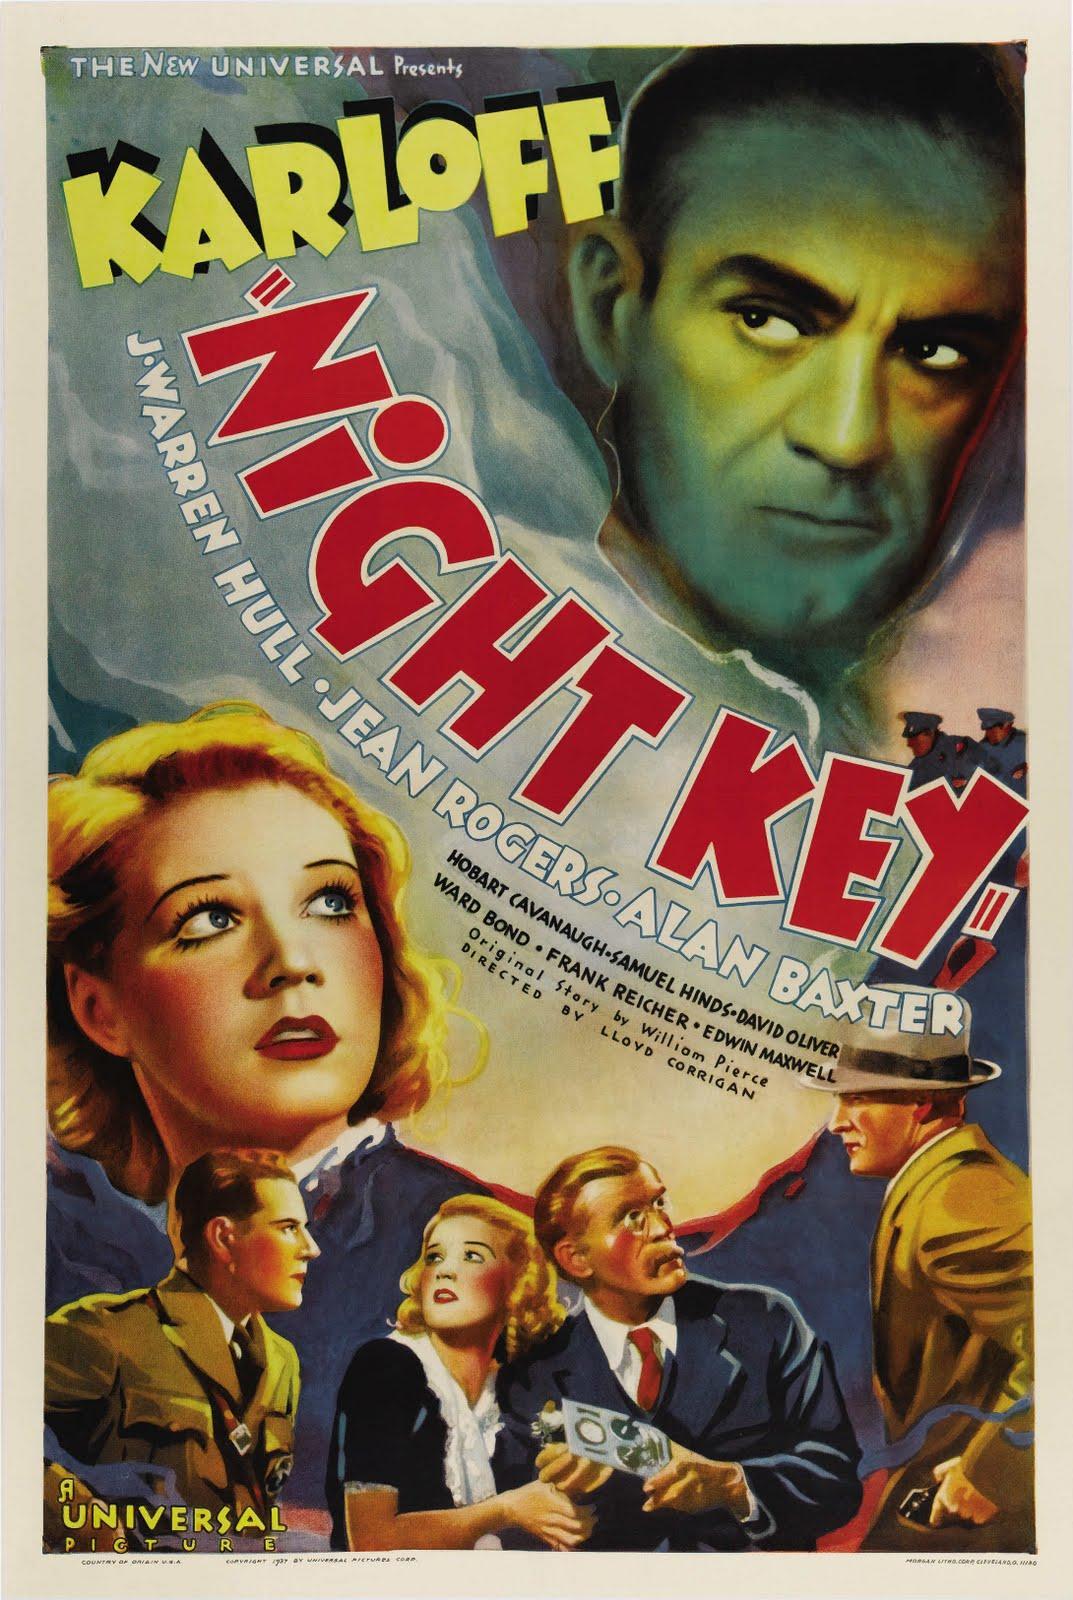 night_key_poster_02.jpg